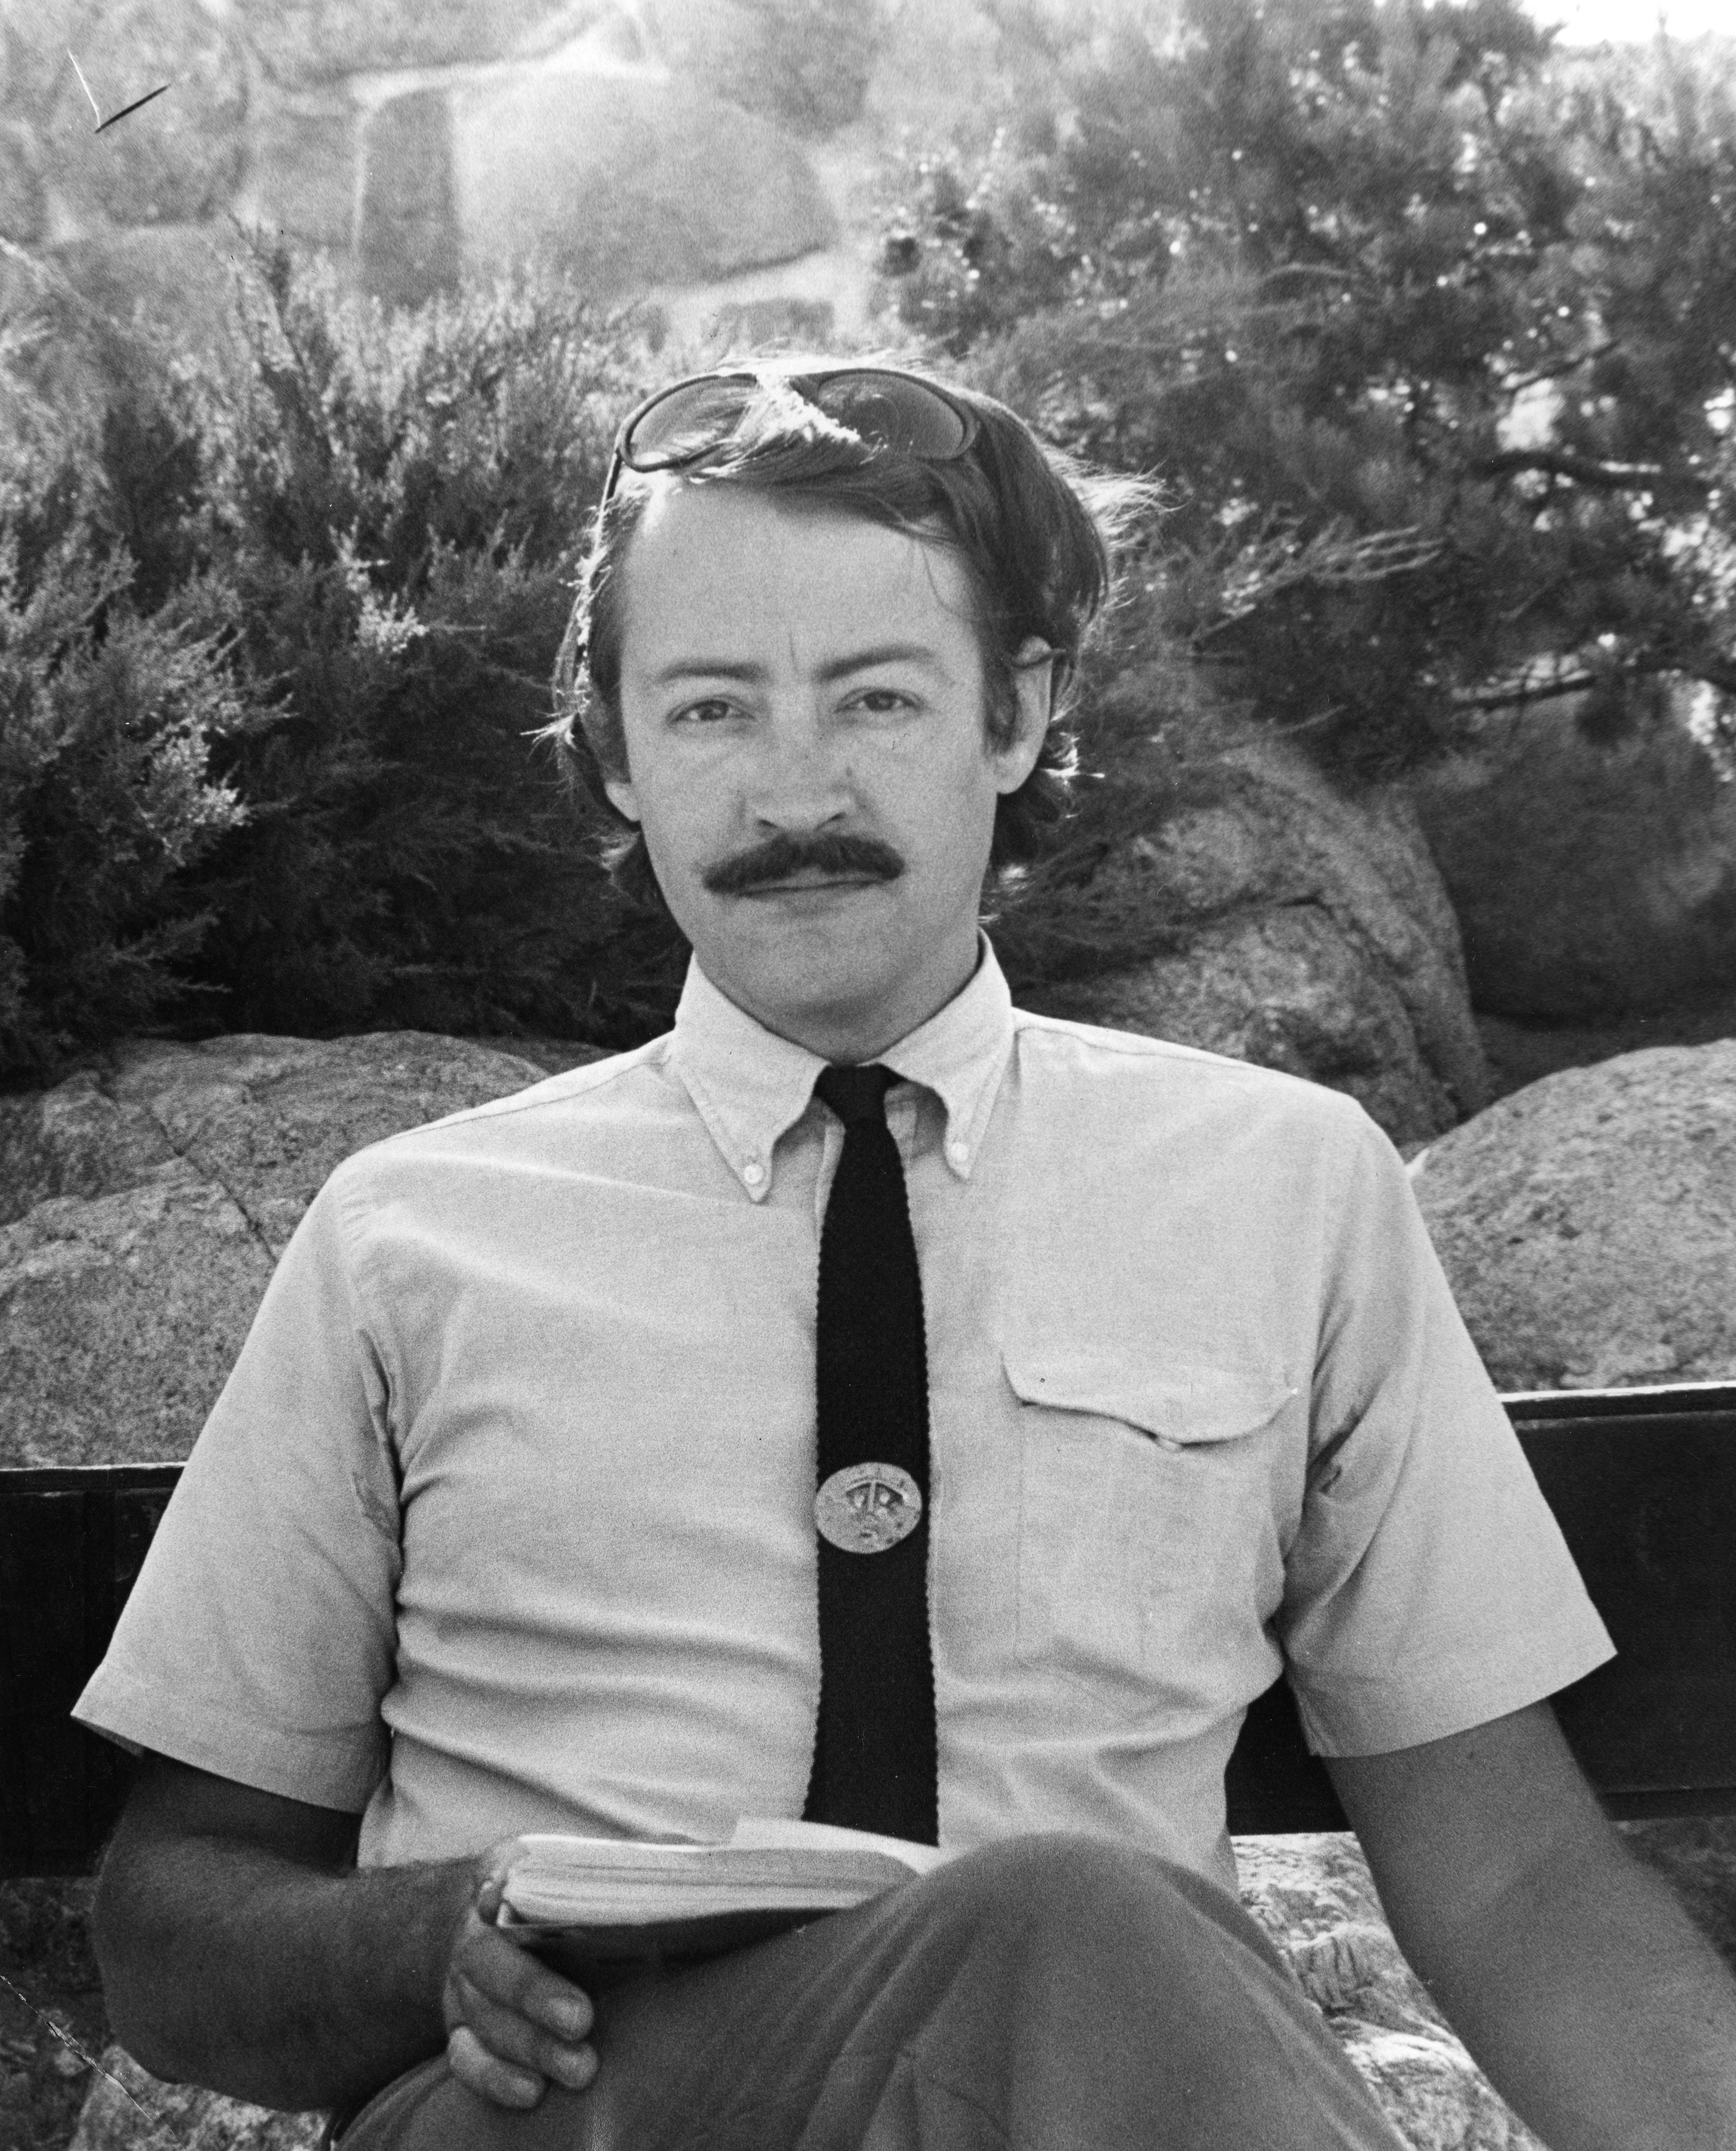 5e3d07e490a90 David C. Jones Seated outside on Campus, St. John's College, Santa Fe, New  Mexico